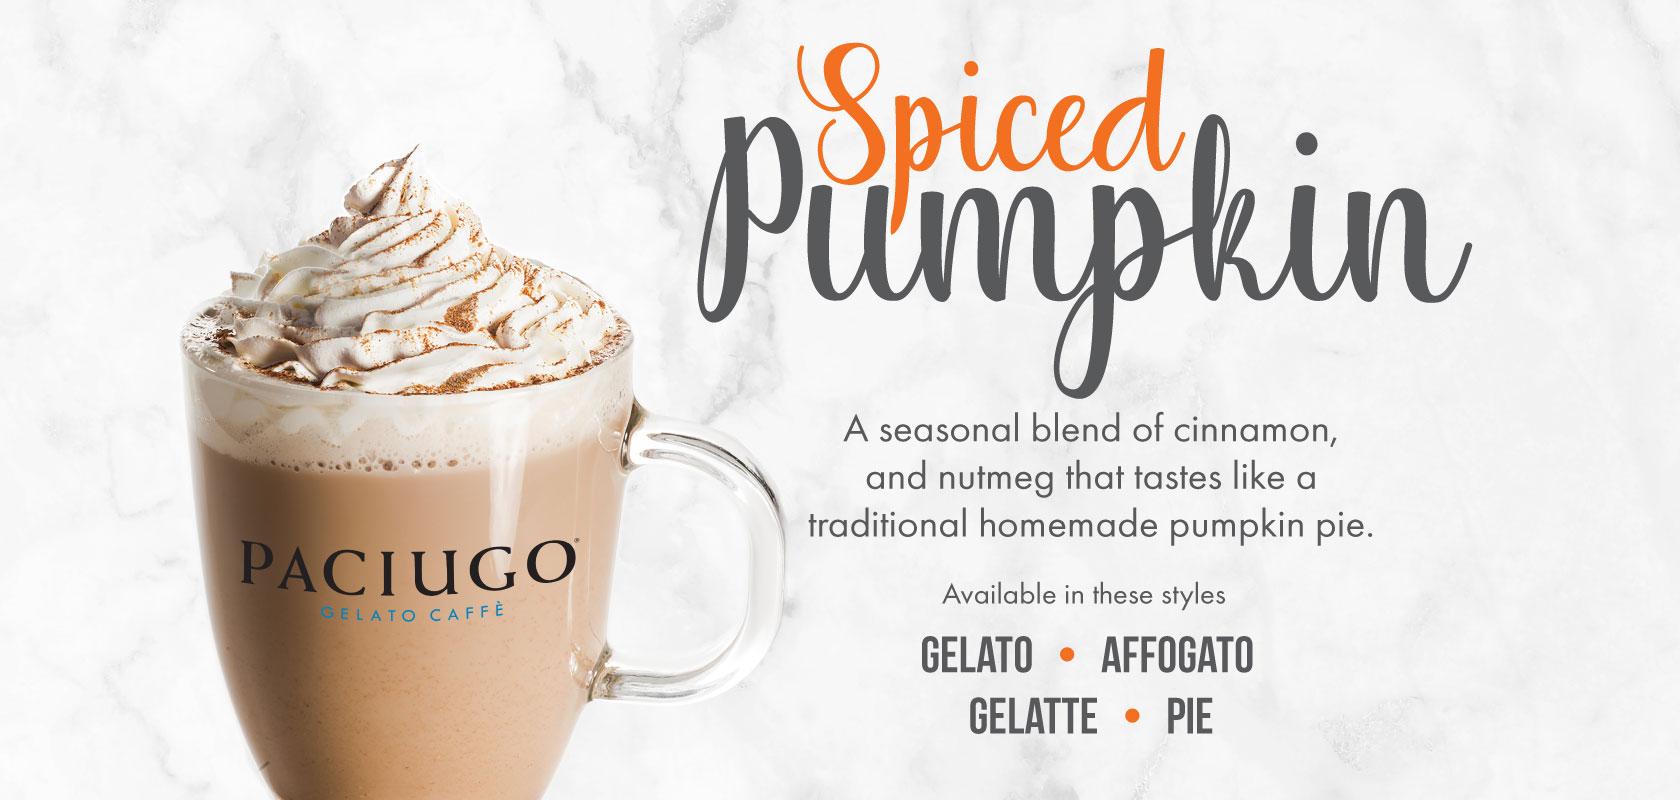 Spiced Pumpkin Gelato! A seasonal blend of cinnamon and nutmeg that taste like a traditional pumpkin pie!